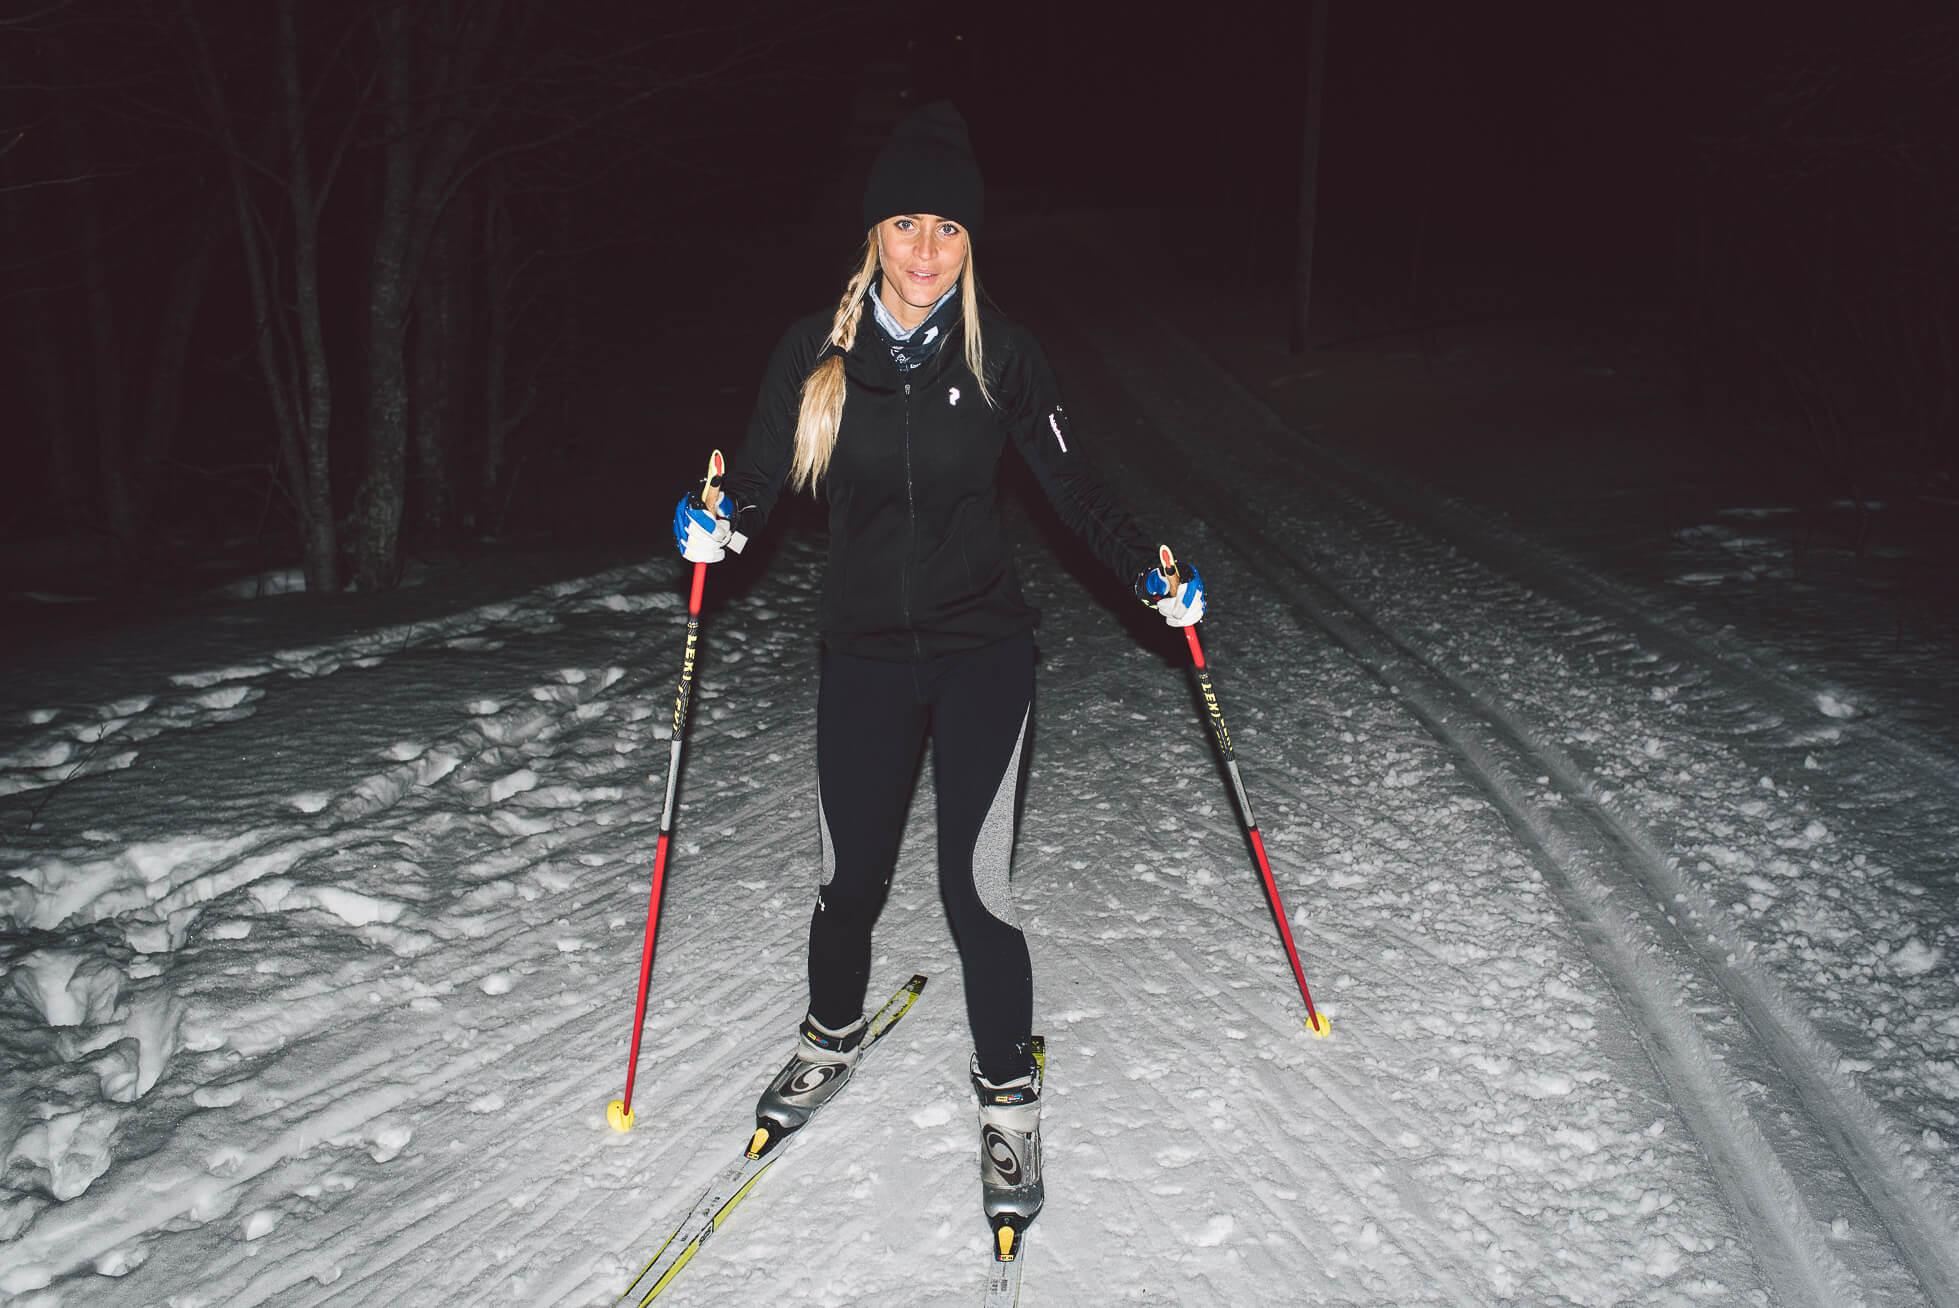 janni-deler-cross-country-skiingDSC_7873